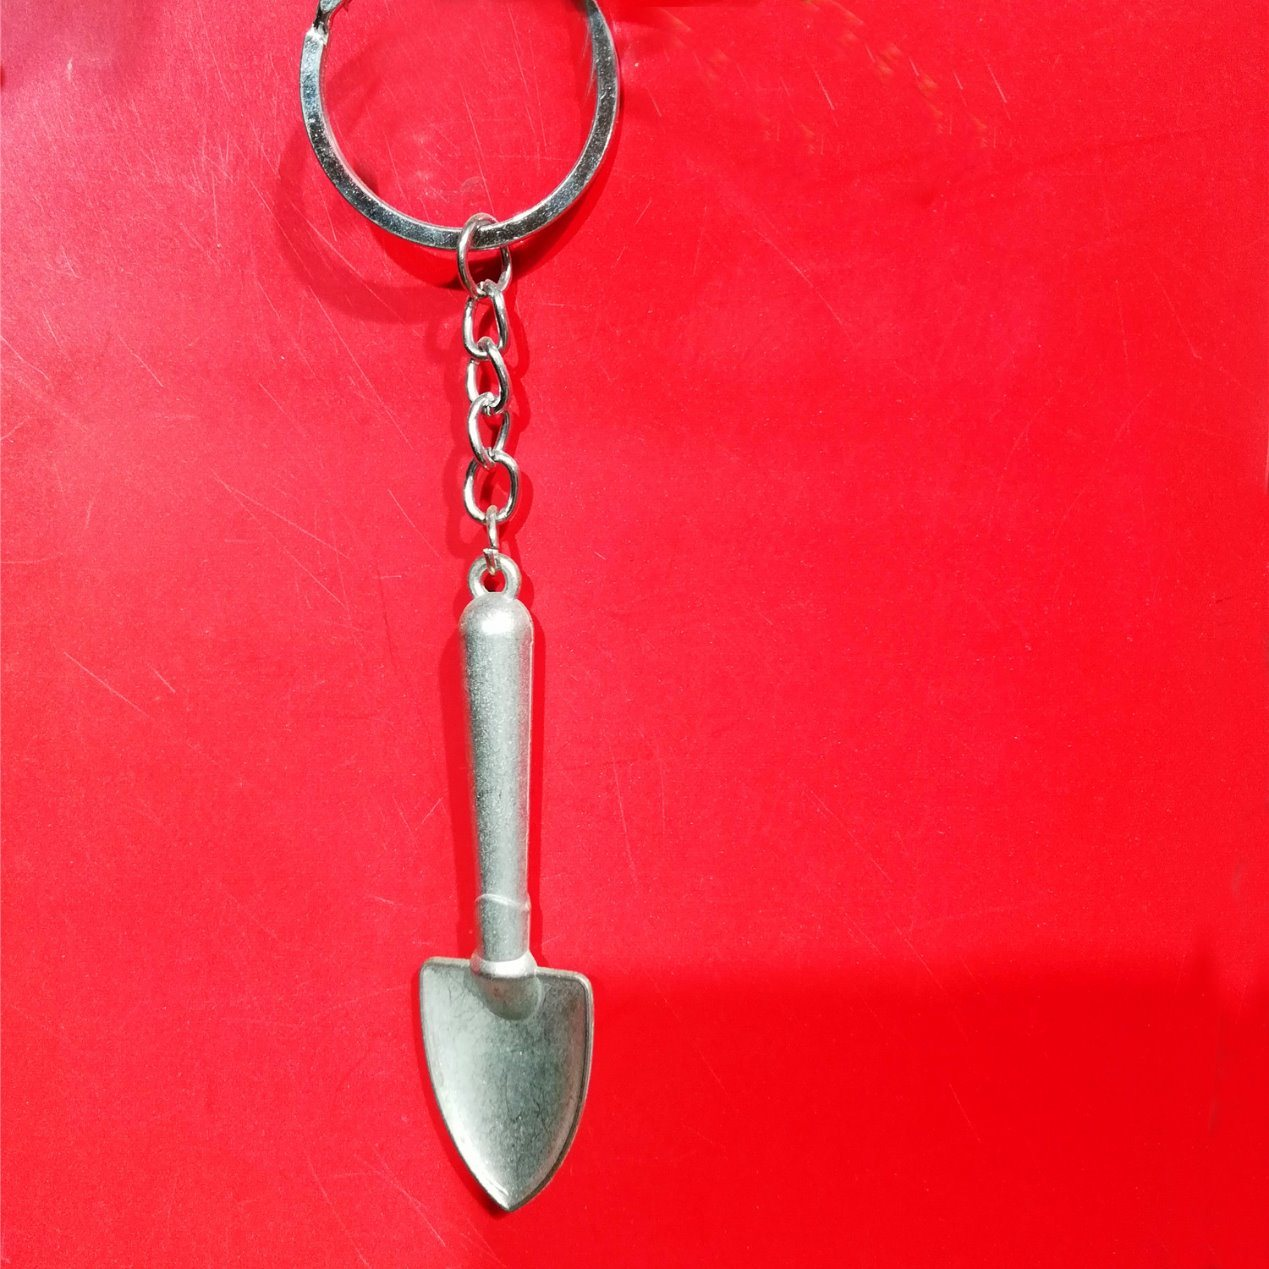 Creative 3D Mini Shovel Working Tool Keychain Keyring Alloy Key Ring Chain Gift